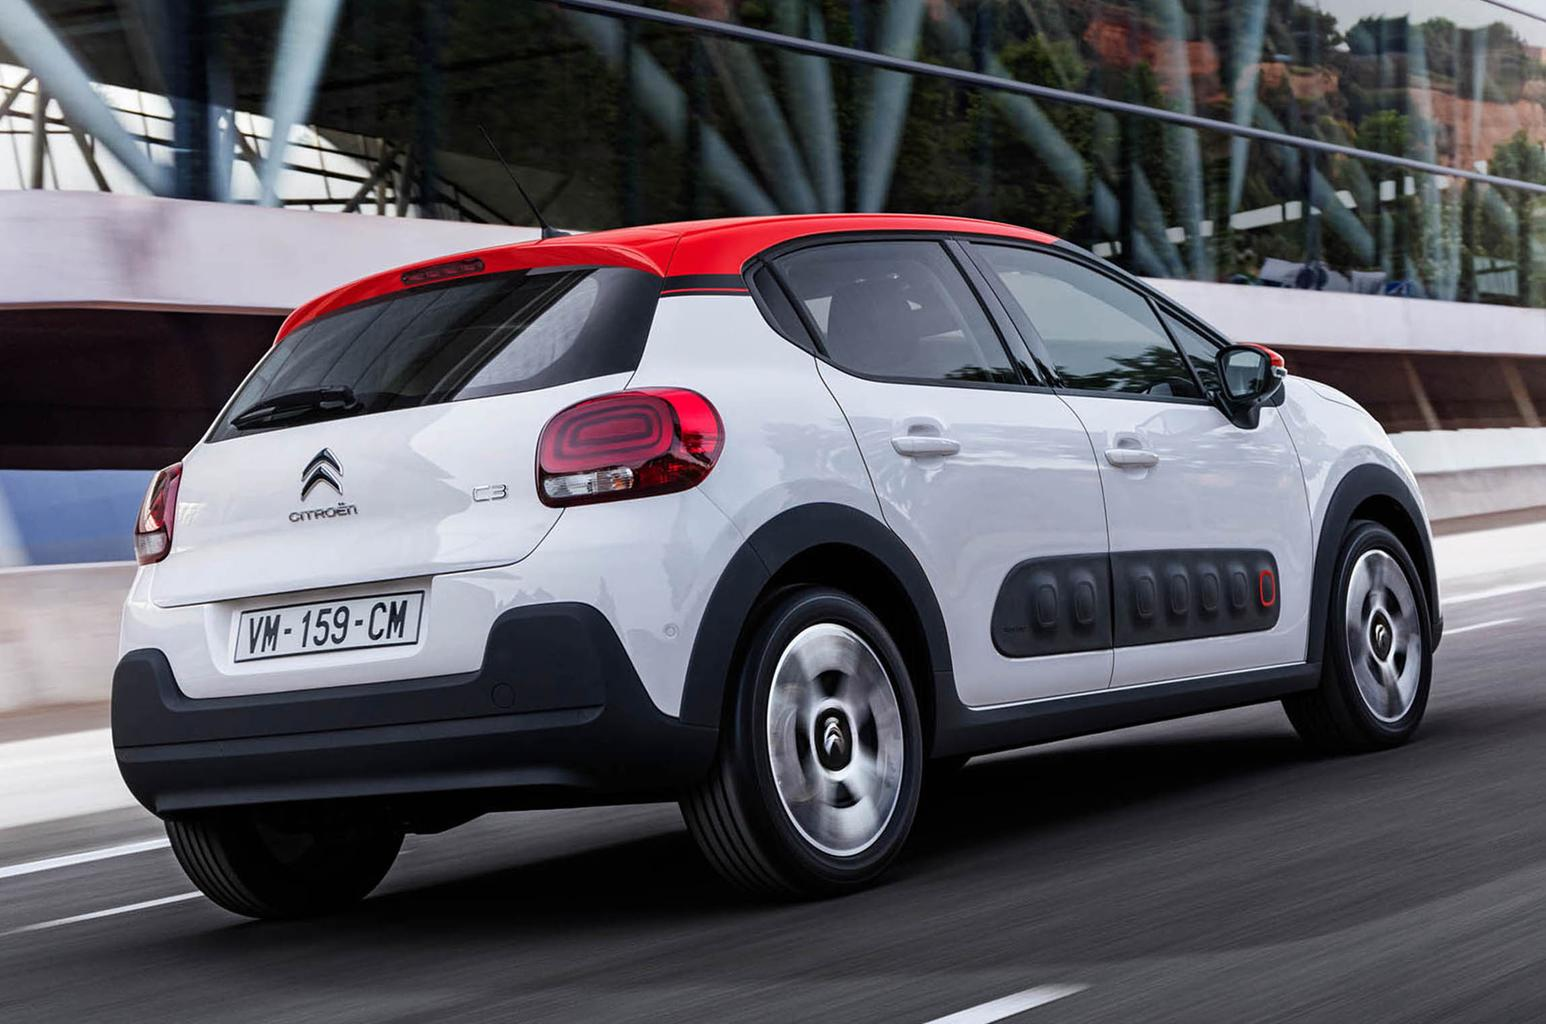 New Citroën C3 revealed